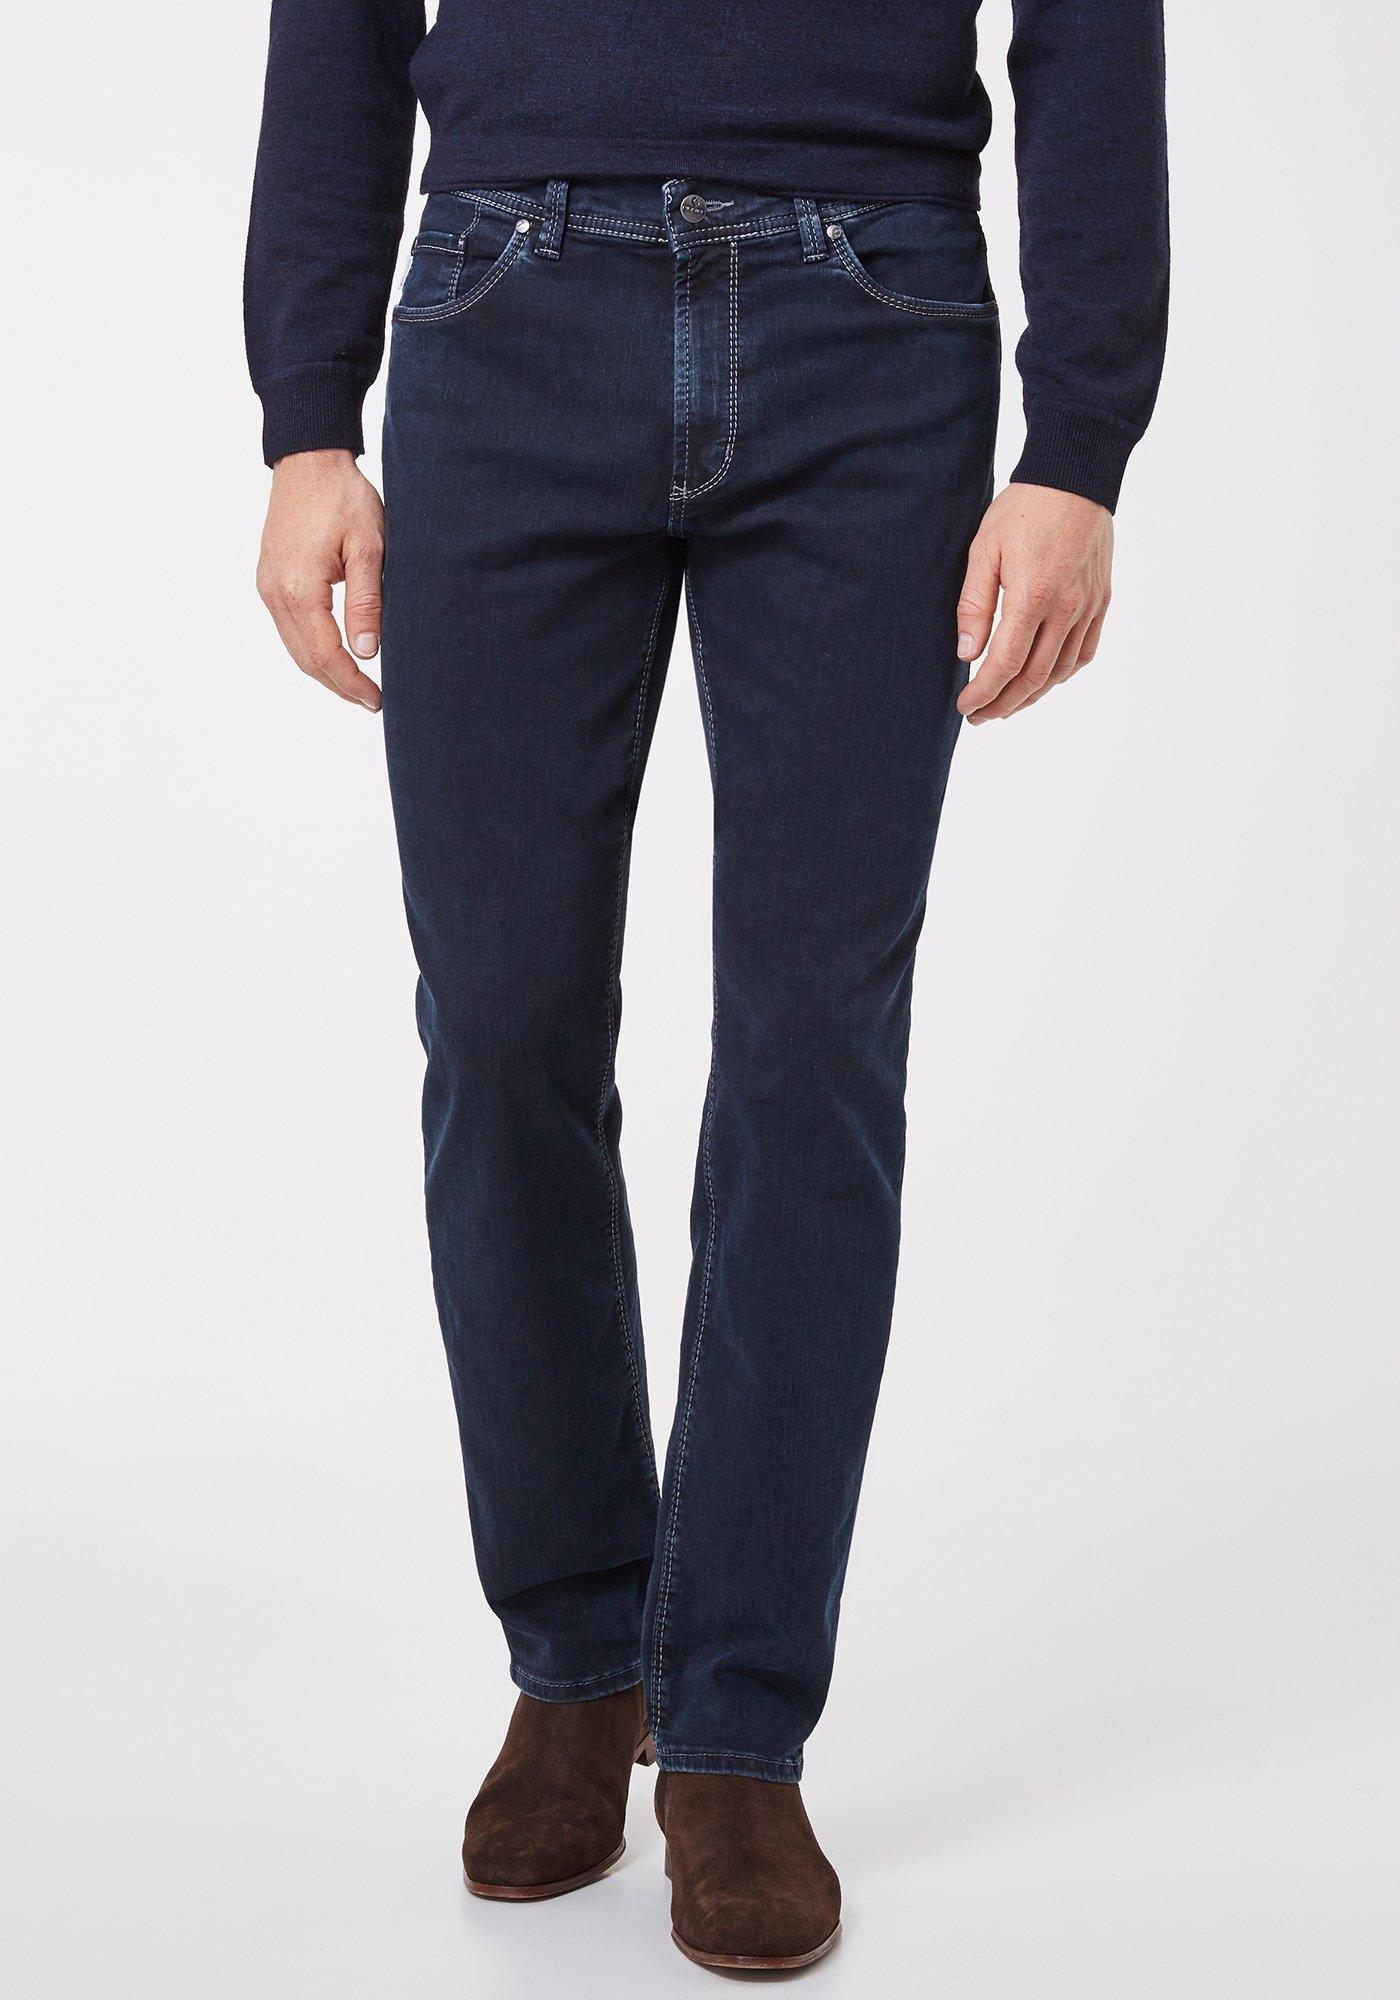 Pionier Jeans & Casuals High Stretch Jeans »THOMAS Regular Fit« nu online kopen bij OTTO